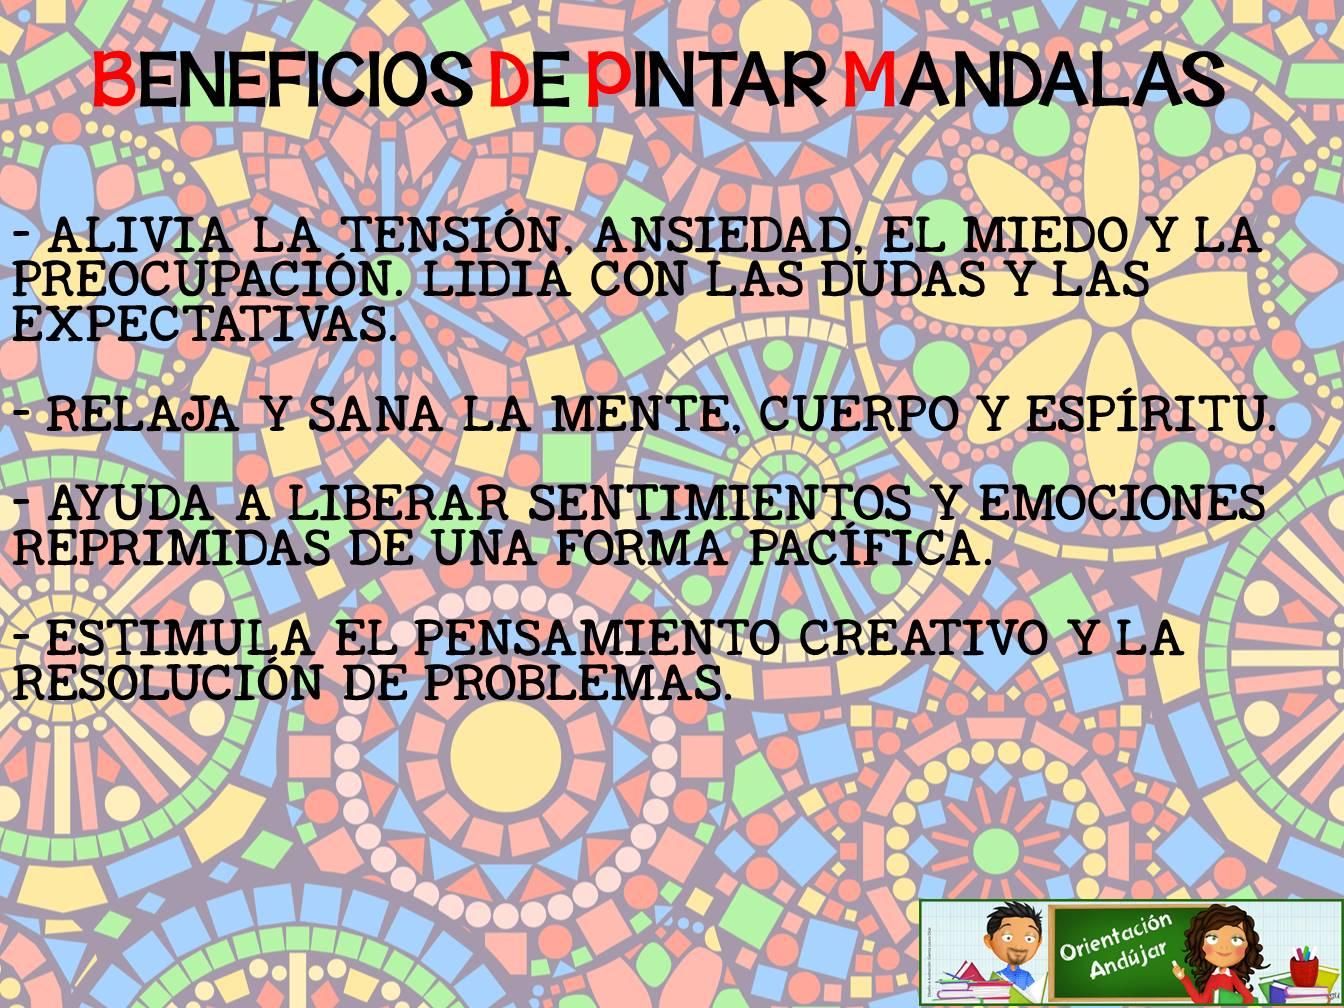 Image Of Mandalas Para Colorear Beneficios Mandalas 5 beneficios